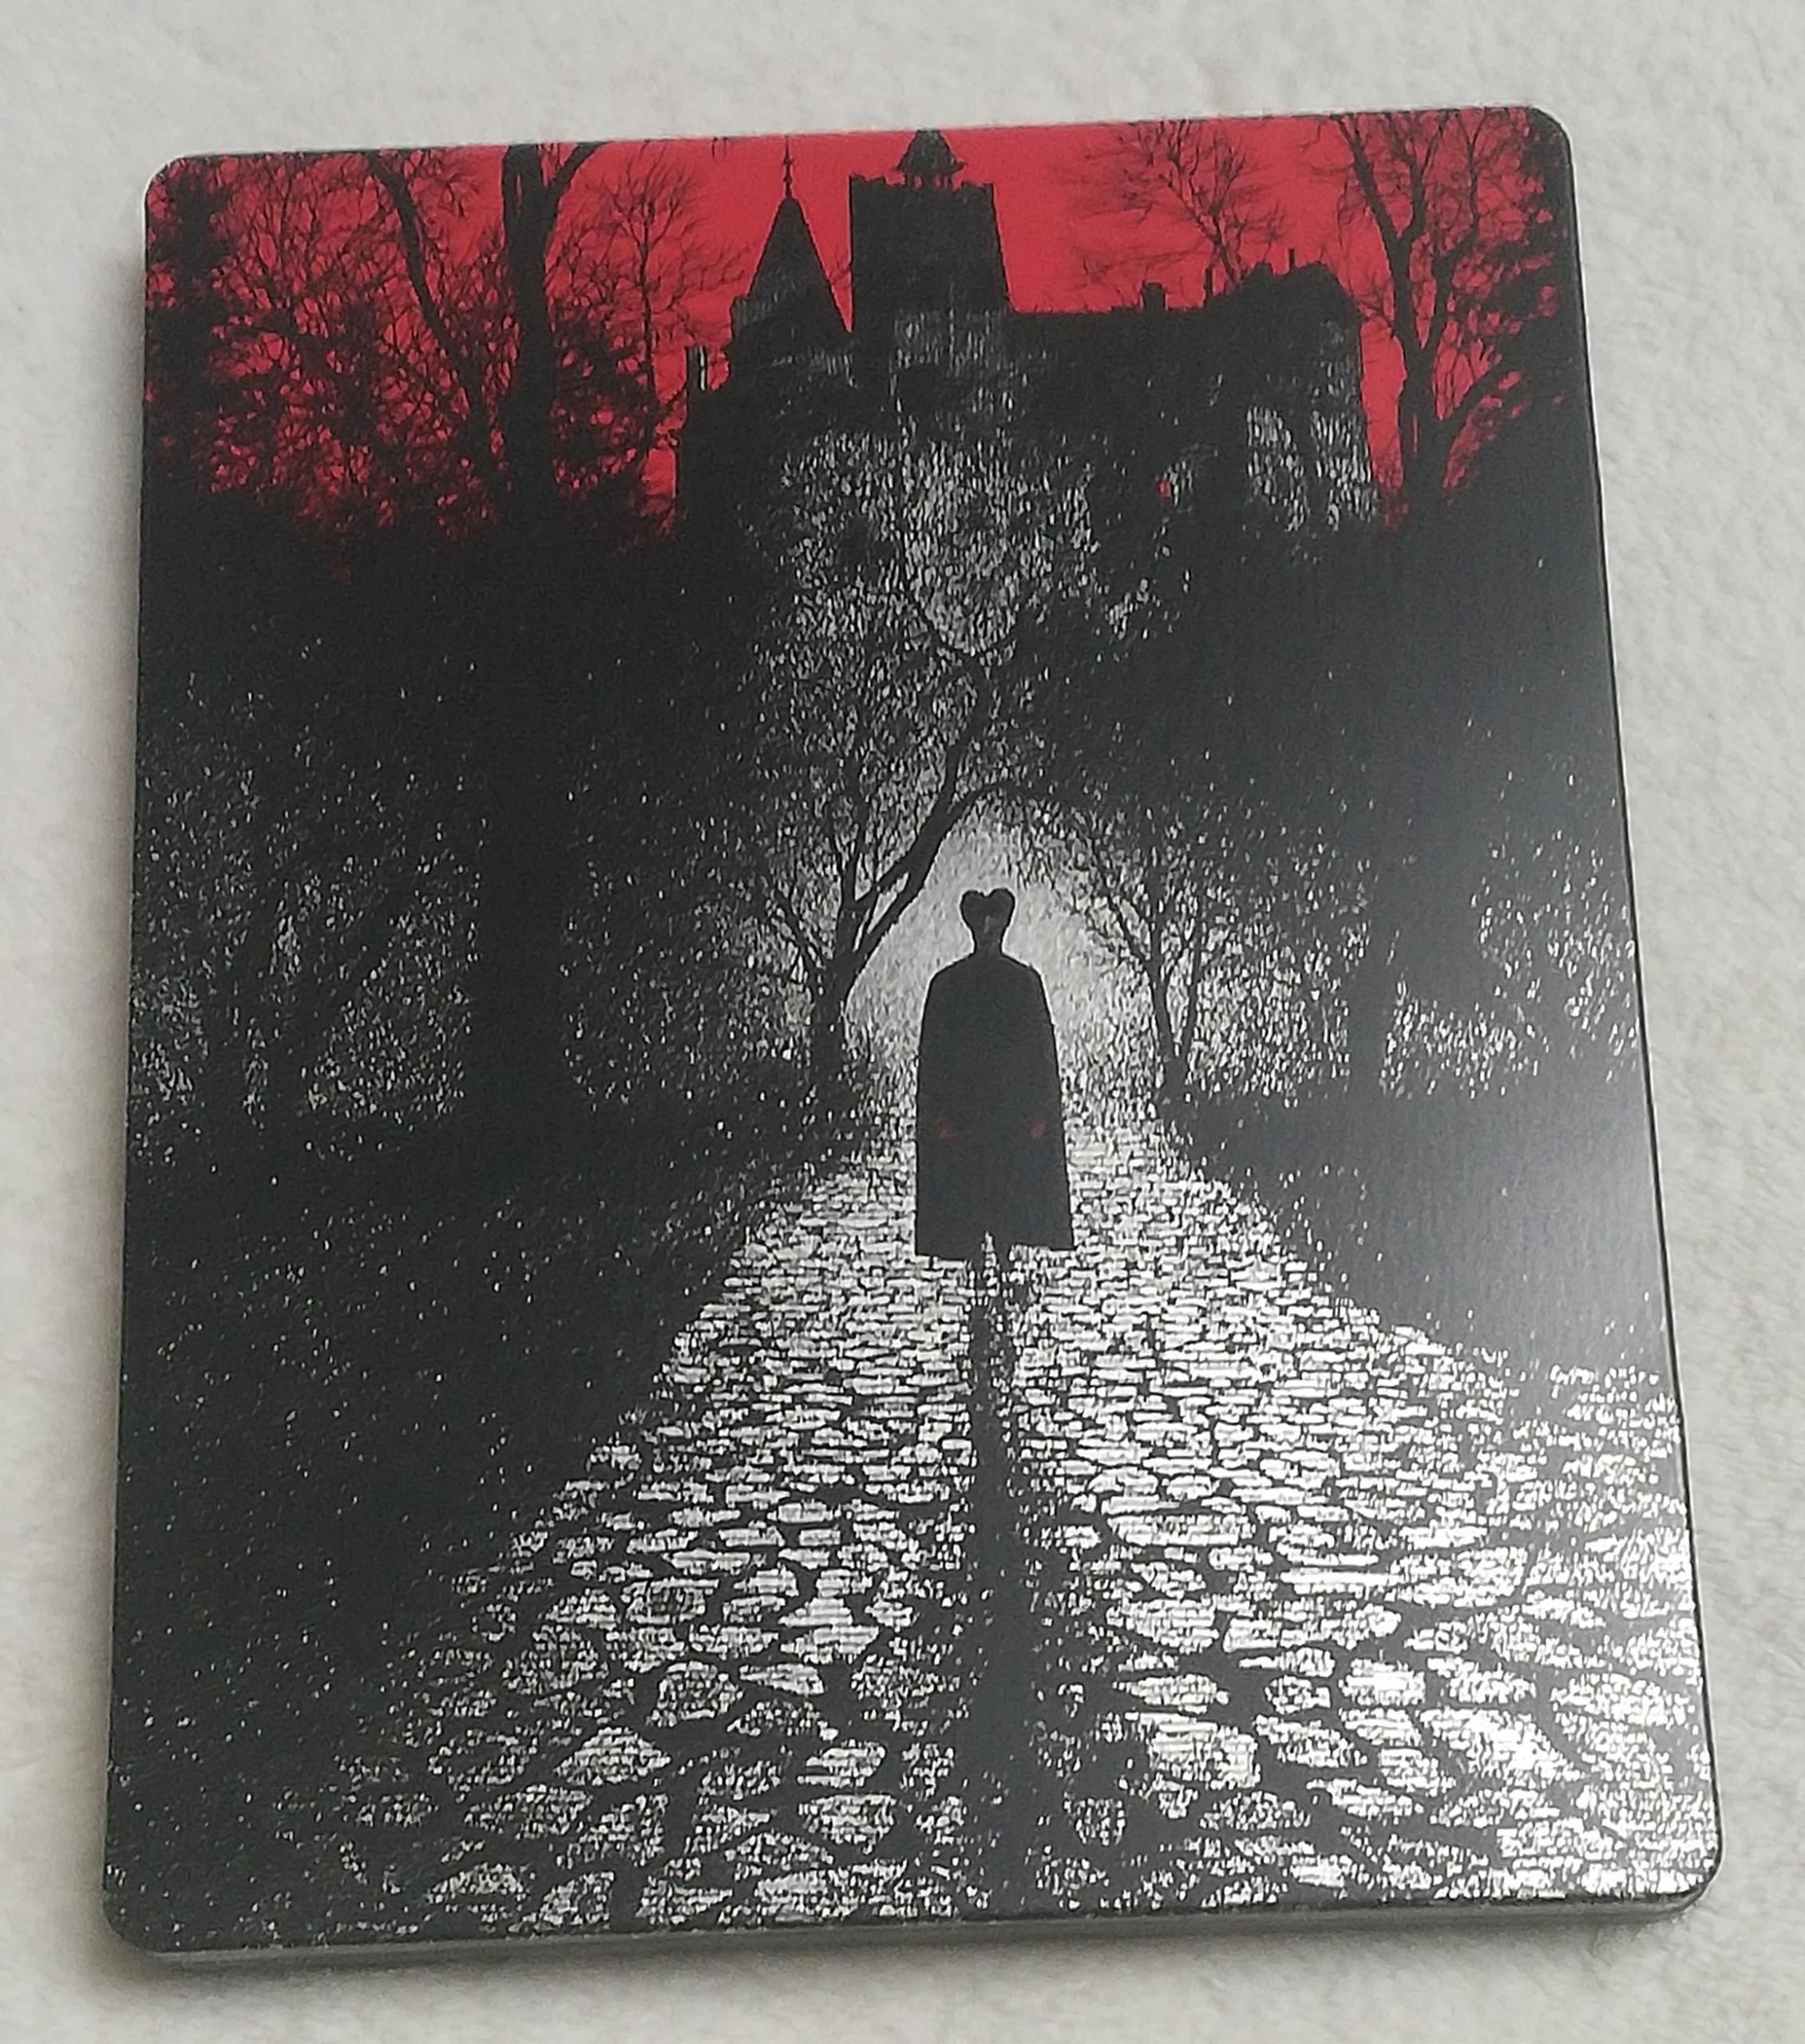 DRACULA - F.F. Coppola [BLU-RAY] STEELBOOK